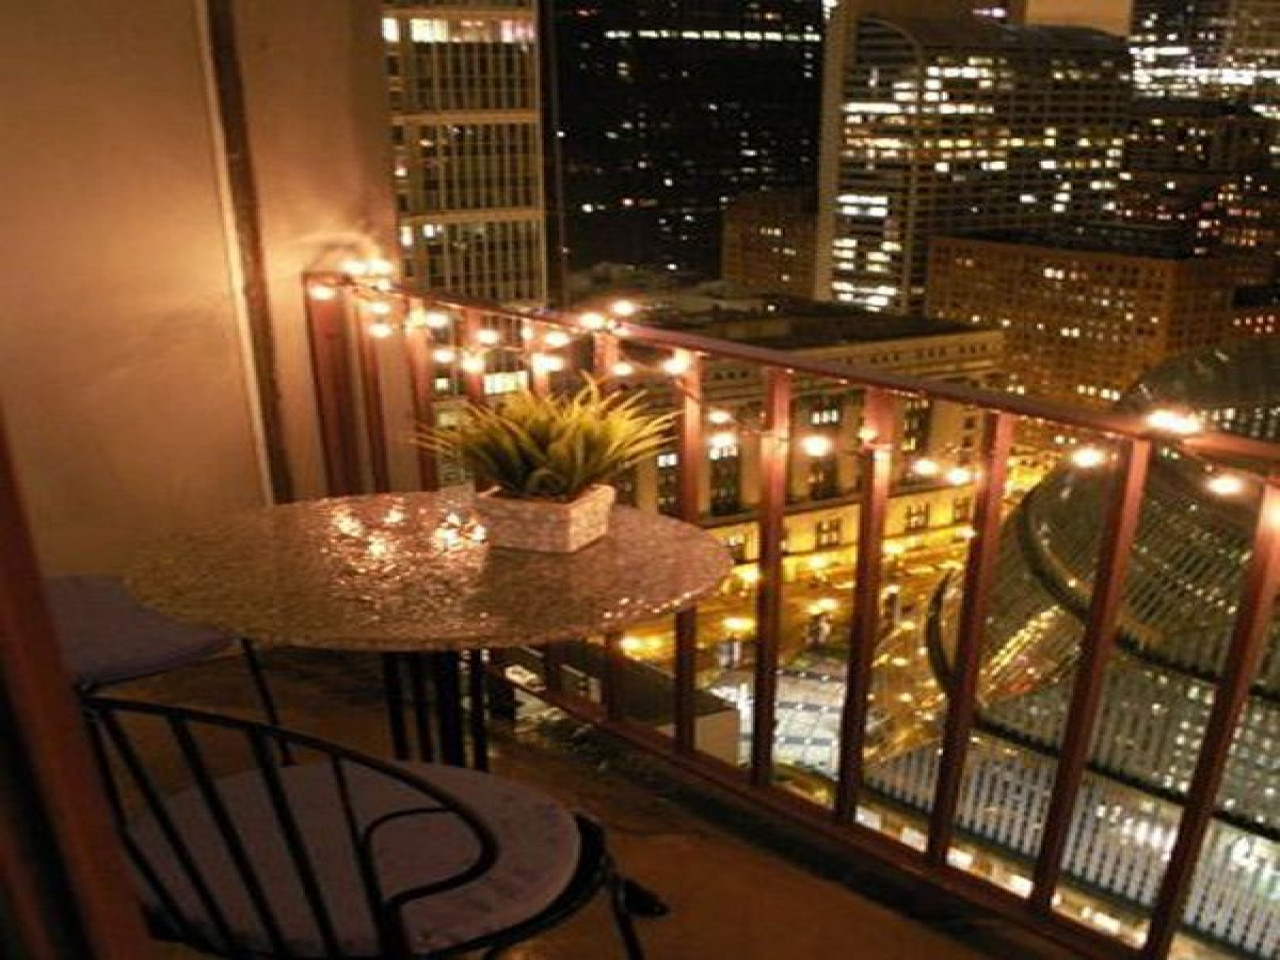 Balcony Christmas Lights  Christmas light decor idea small balcony ideas about